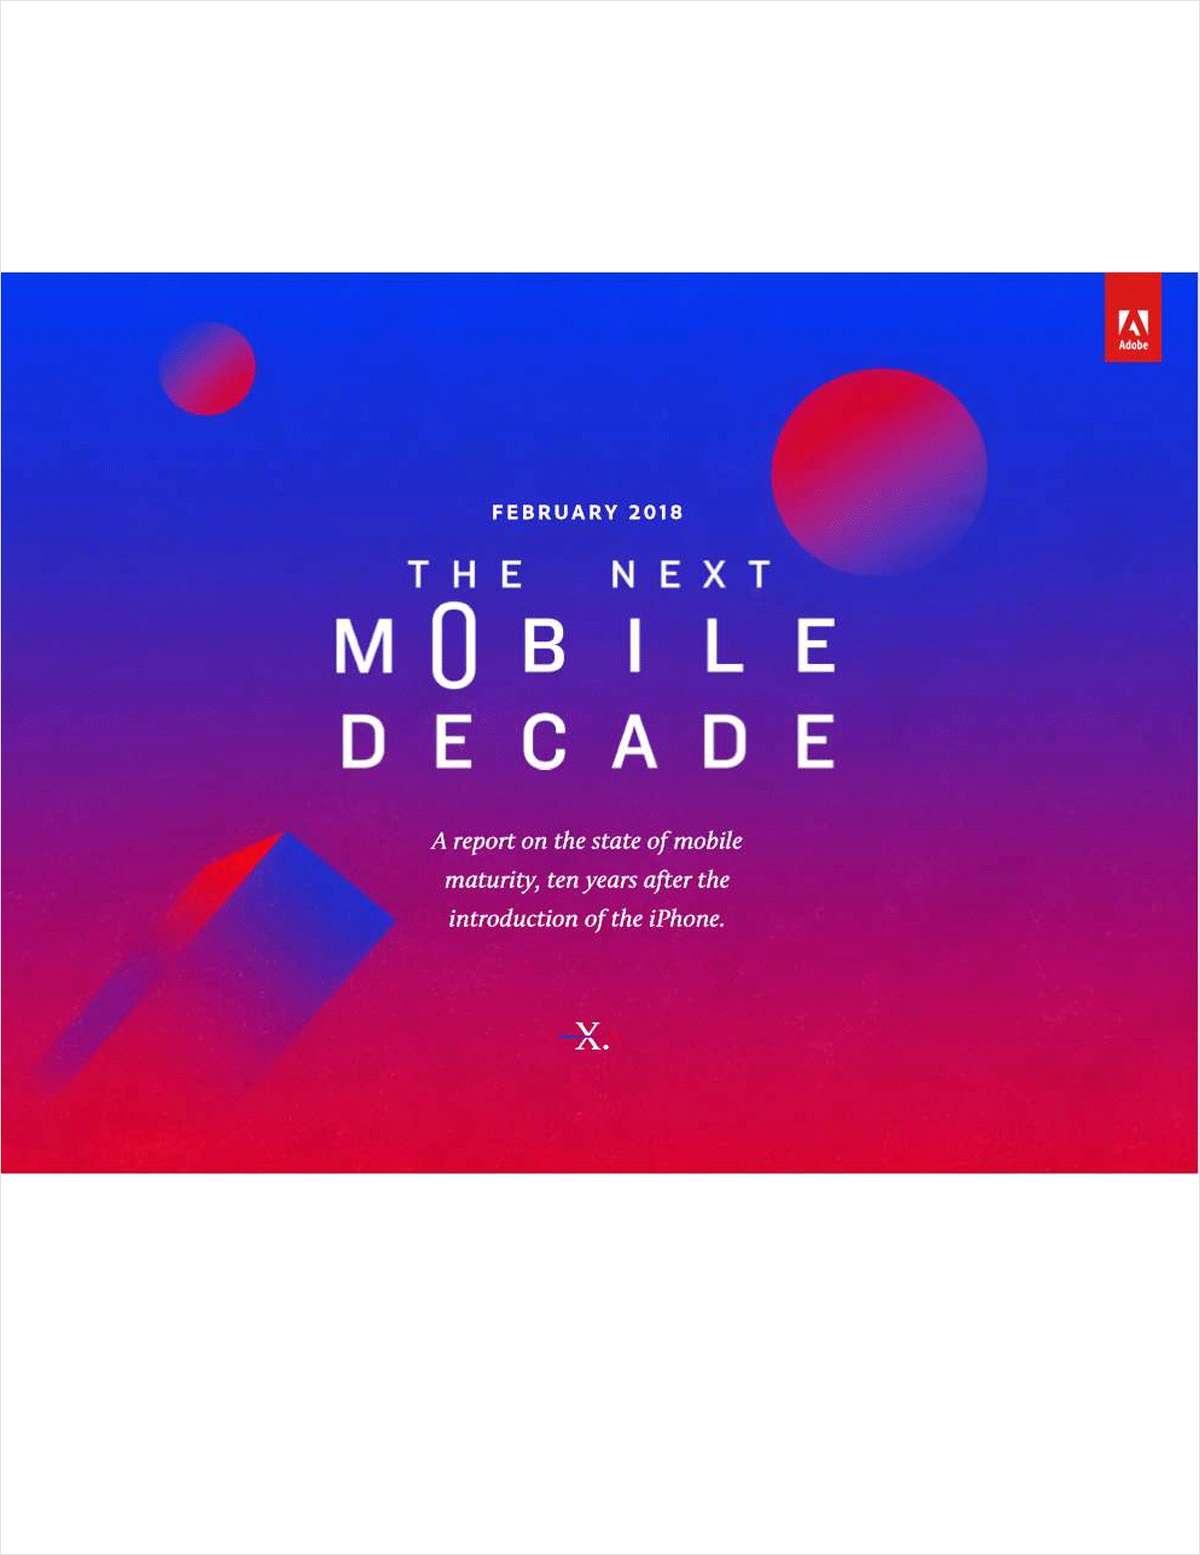 The Next Mobile Decade